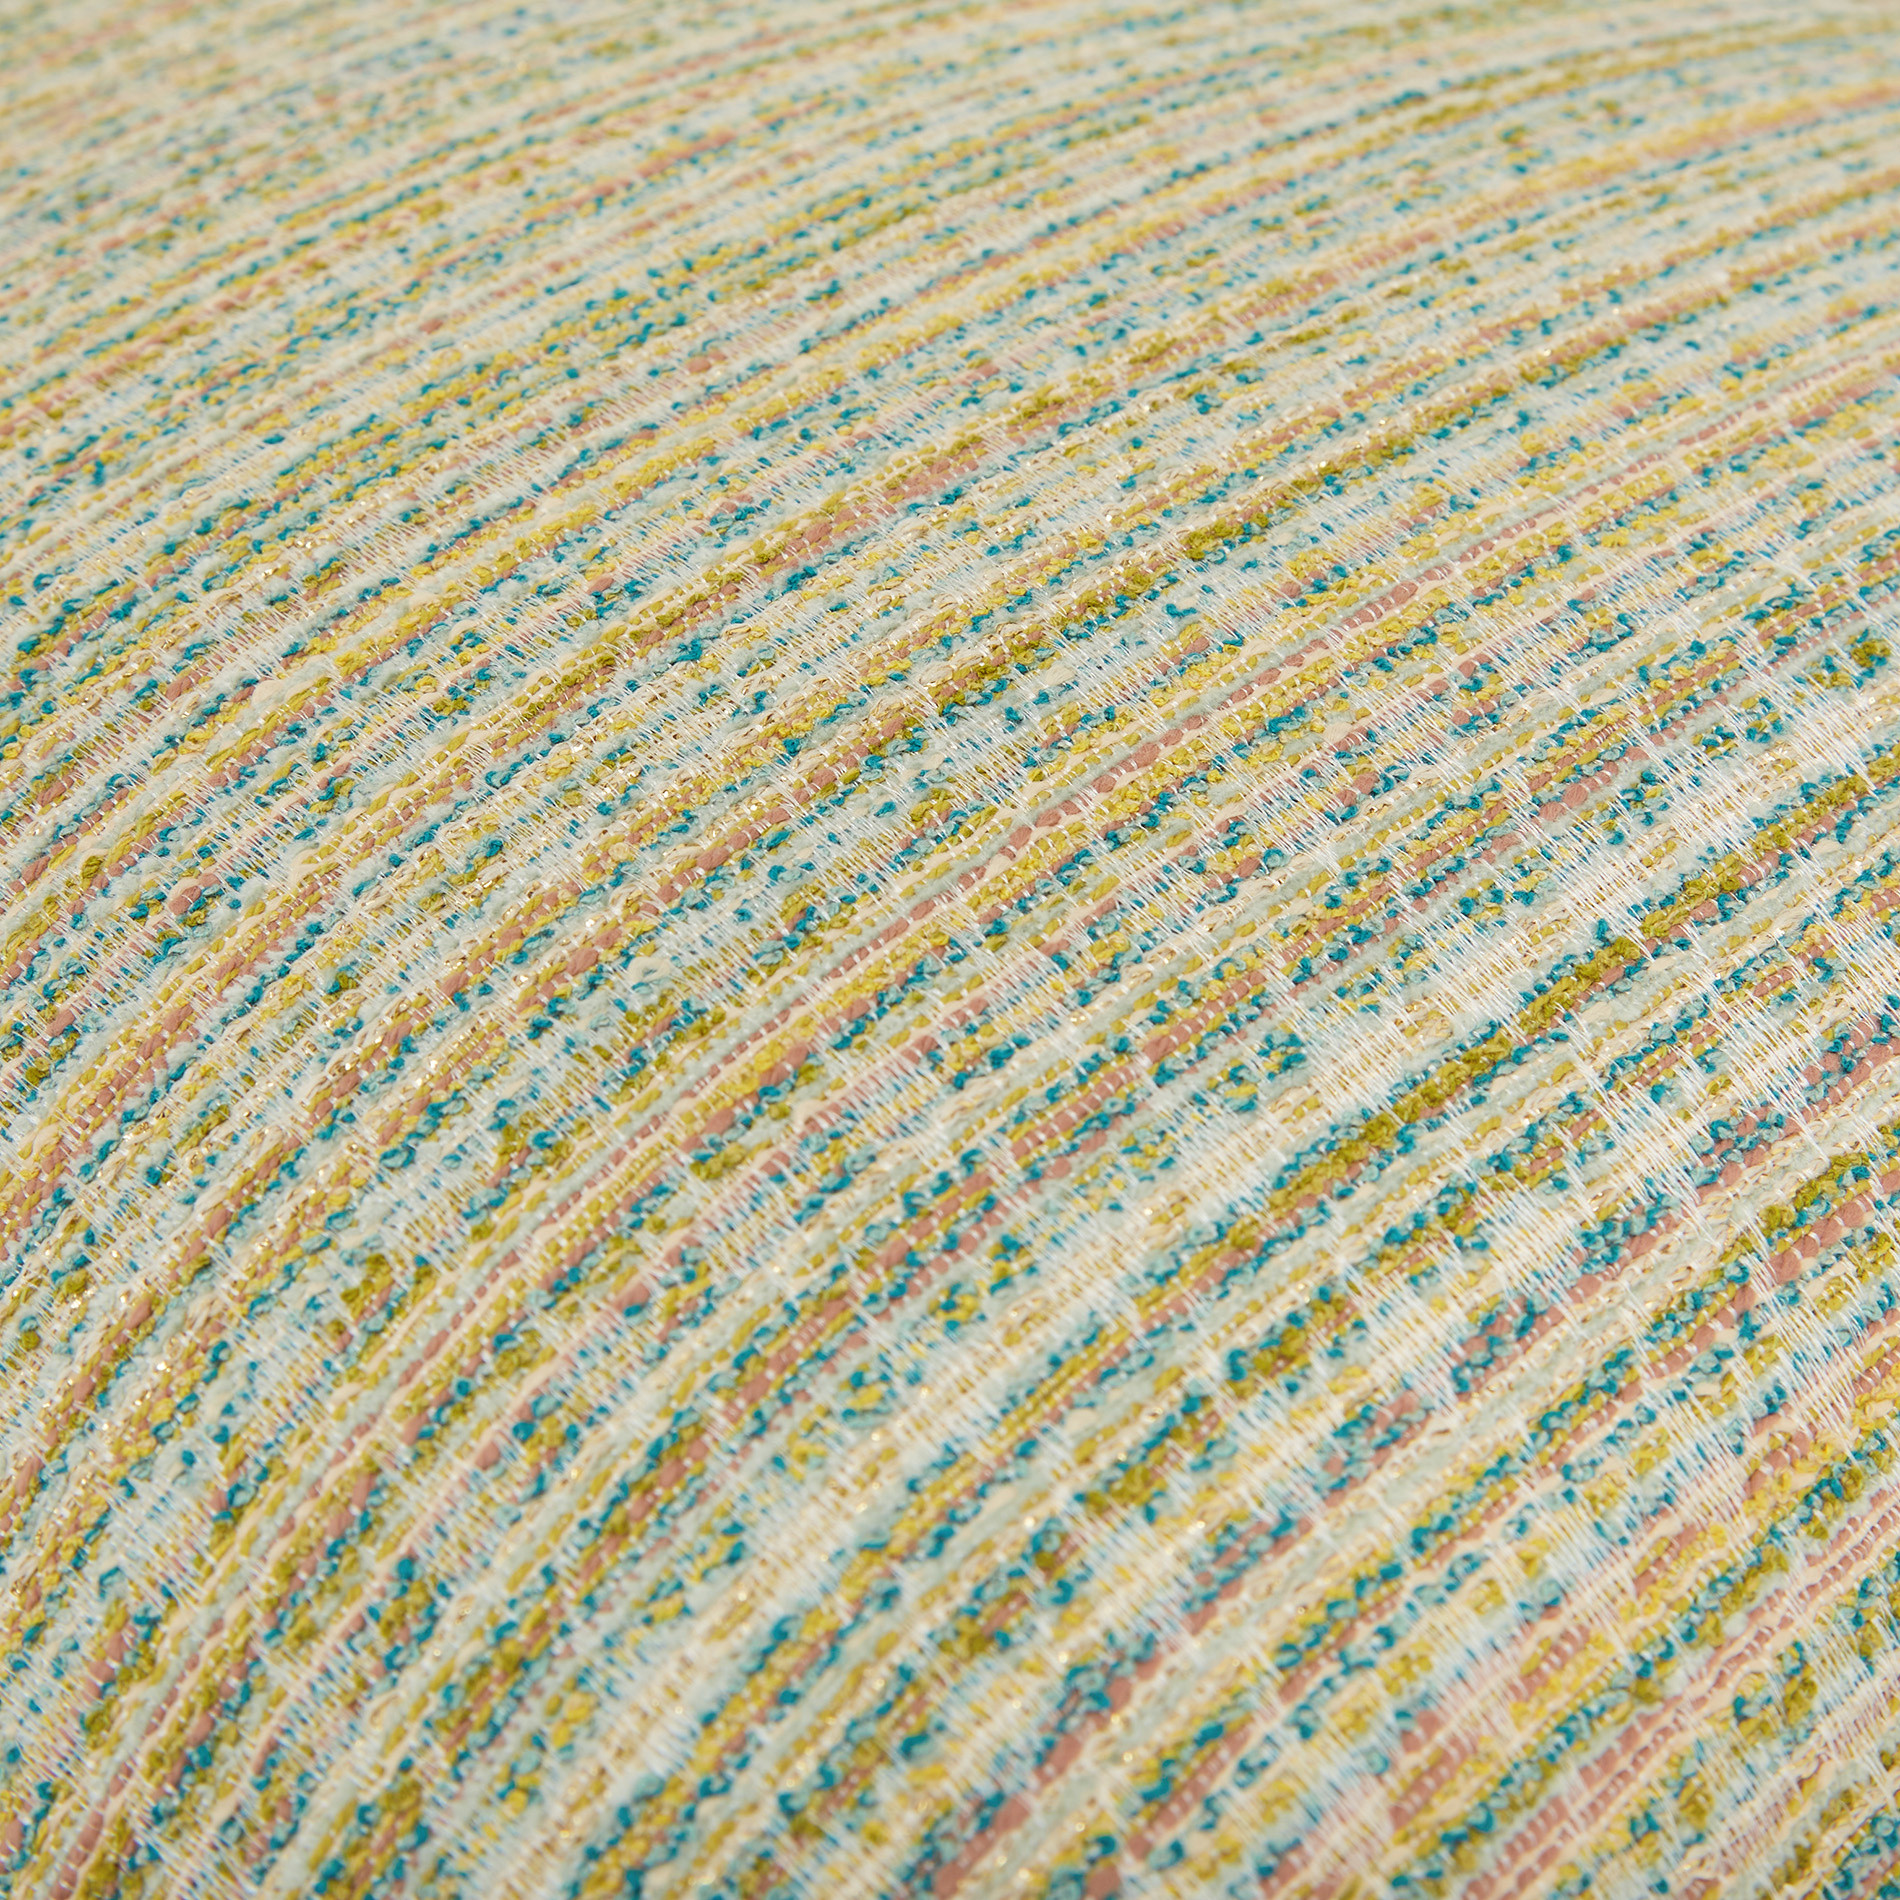 Cuscino jacquard motivo multicolore 45x45cm, Multicolor, large image number 3